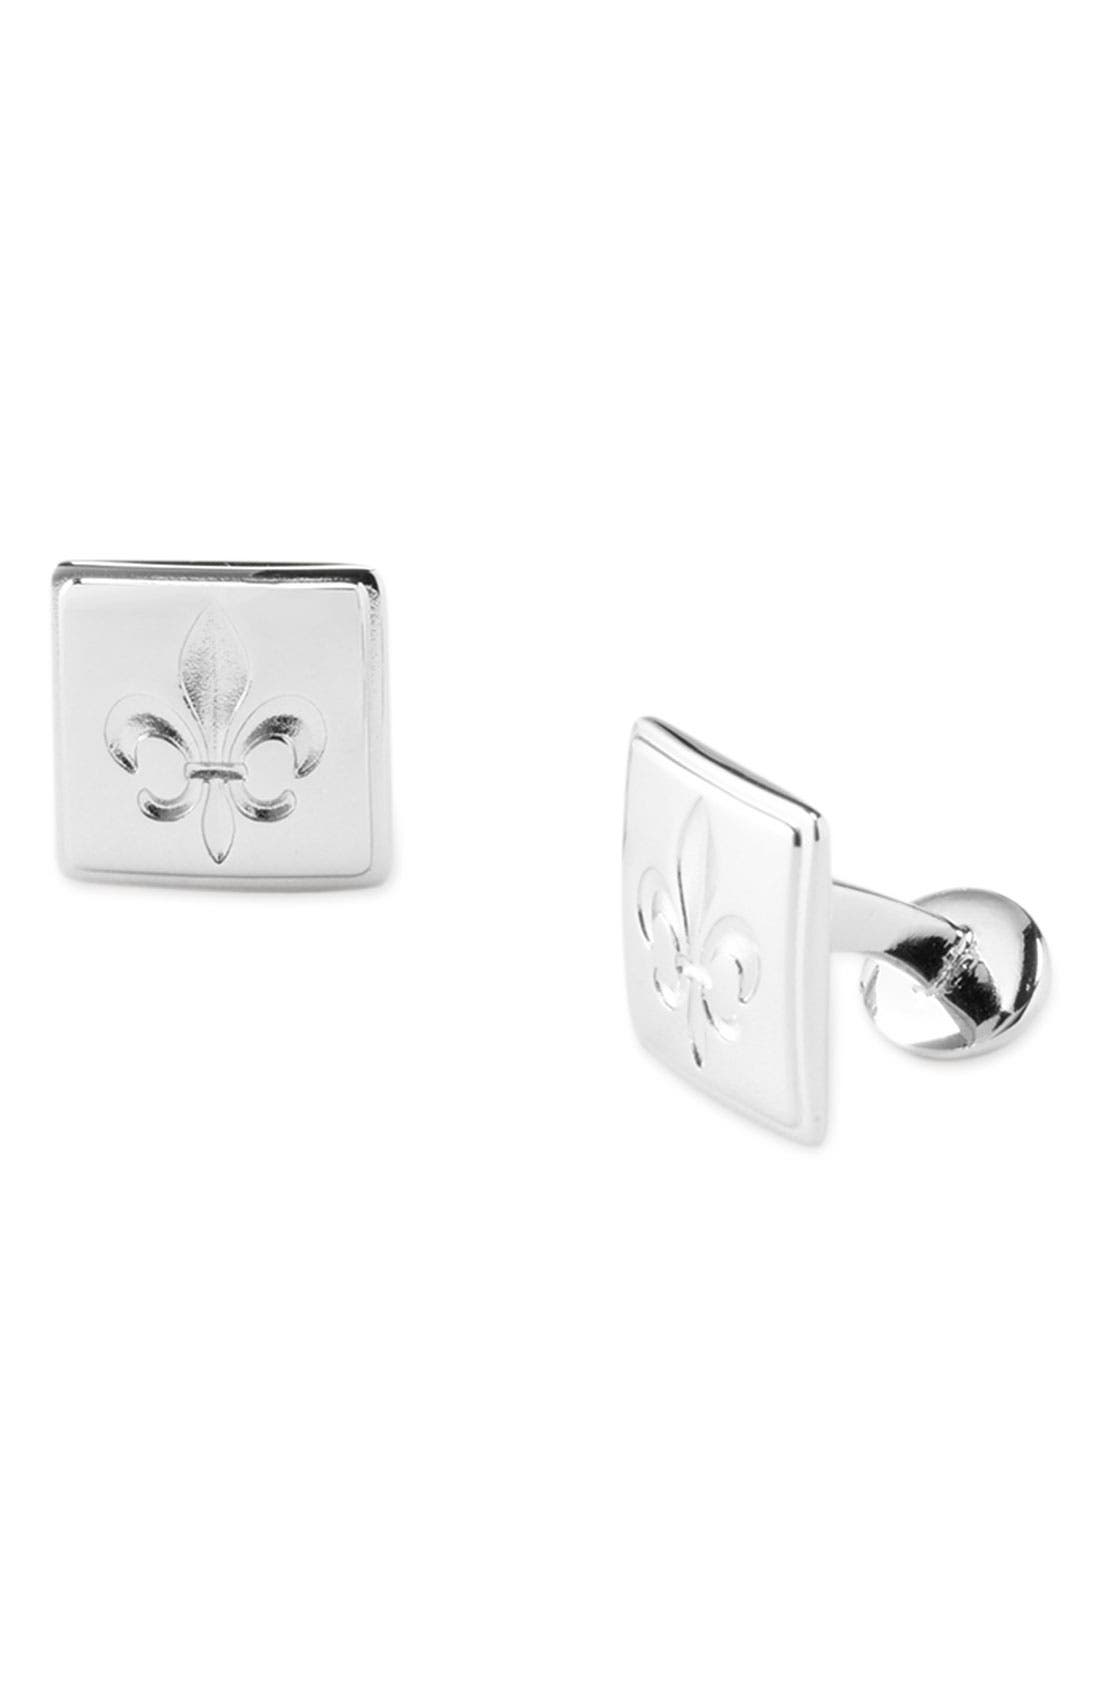 David Donahue 'Fleur de Lis' Sterling Silver Cuff Links